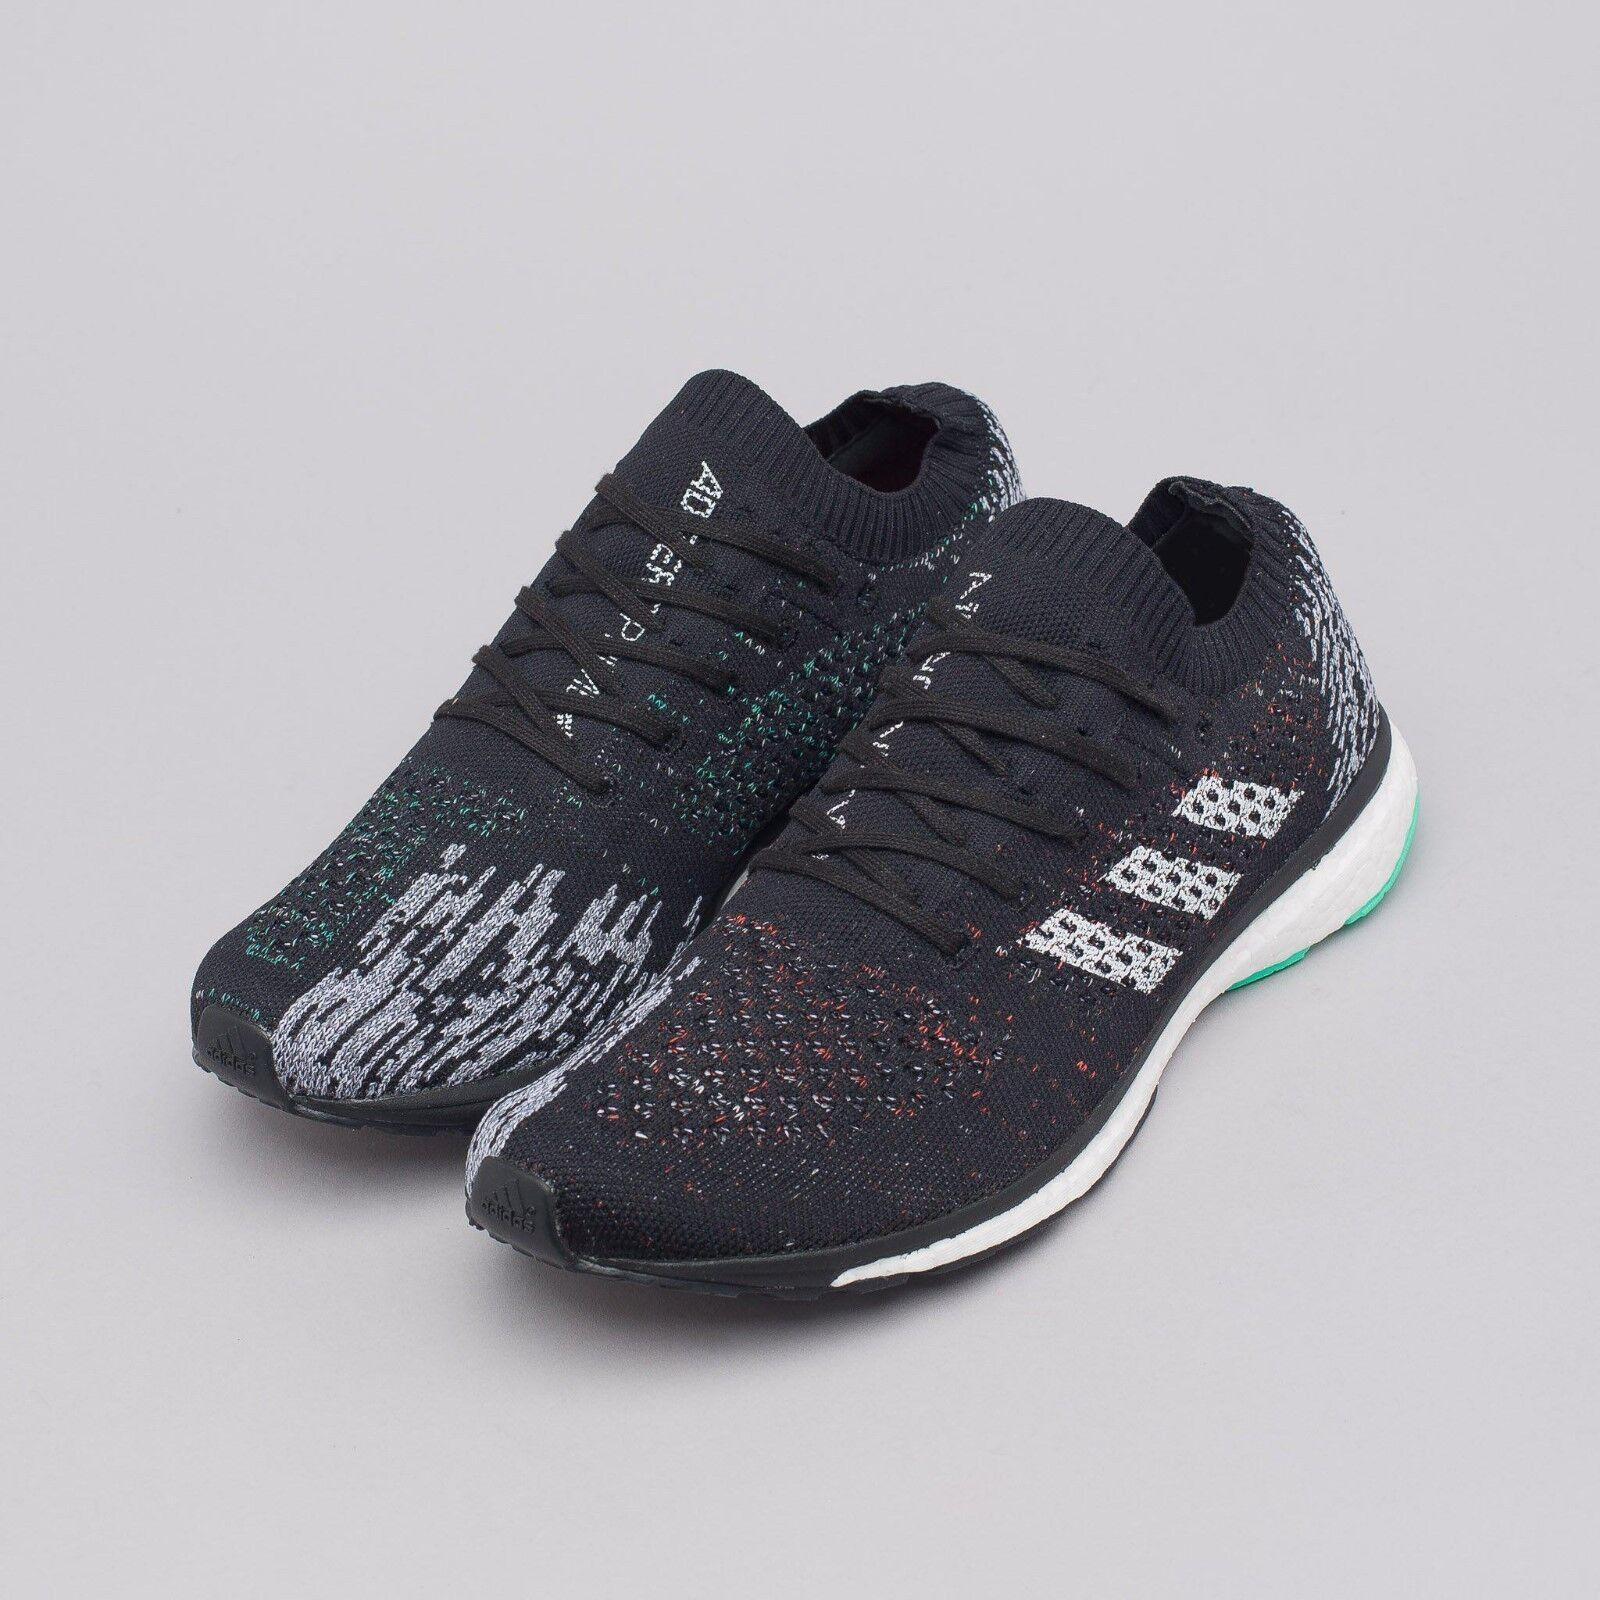 separation shoes a9875 02e3e Adidas Adizero Prime Ltd, Men s Sizes 9-10.5-11 9-10.5-